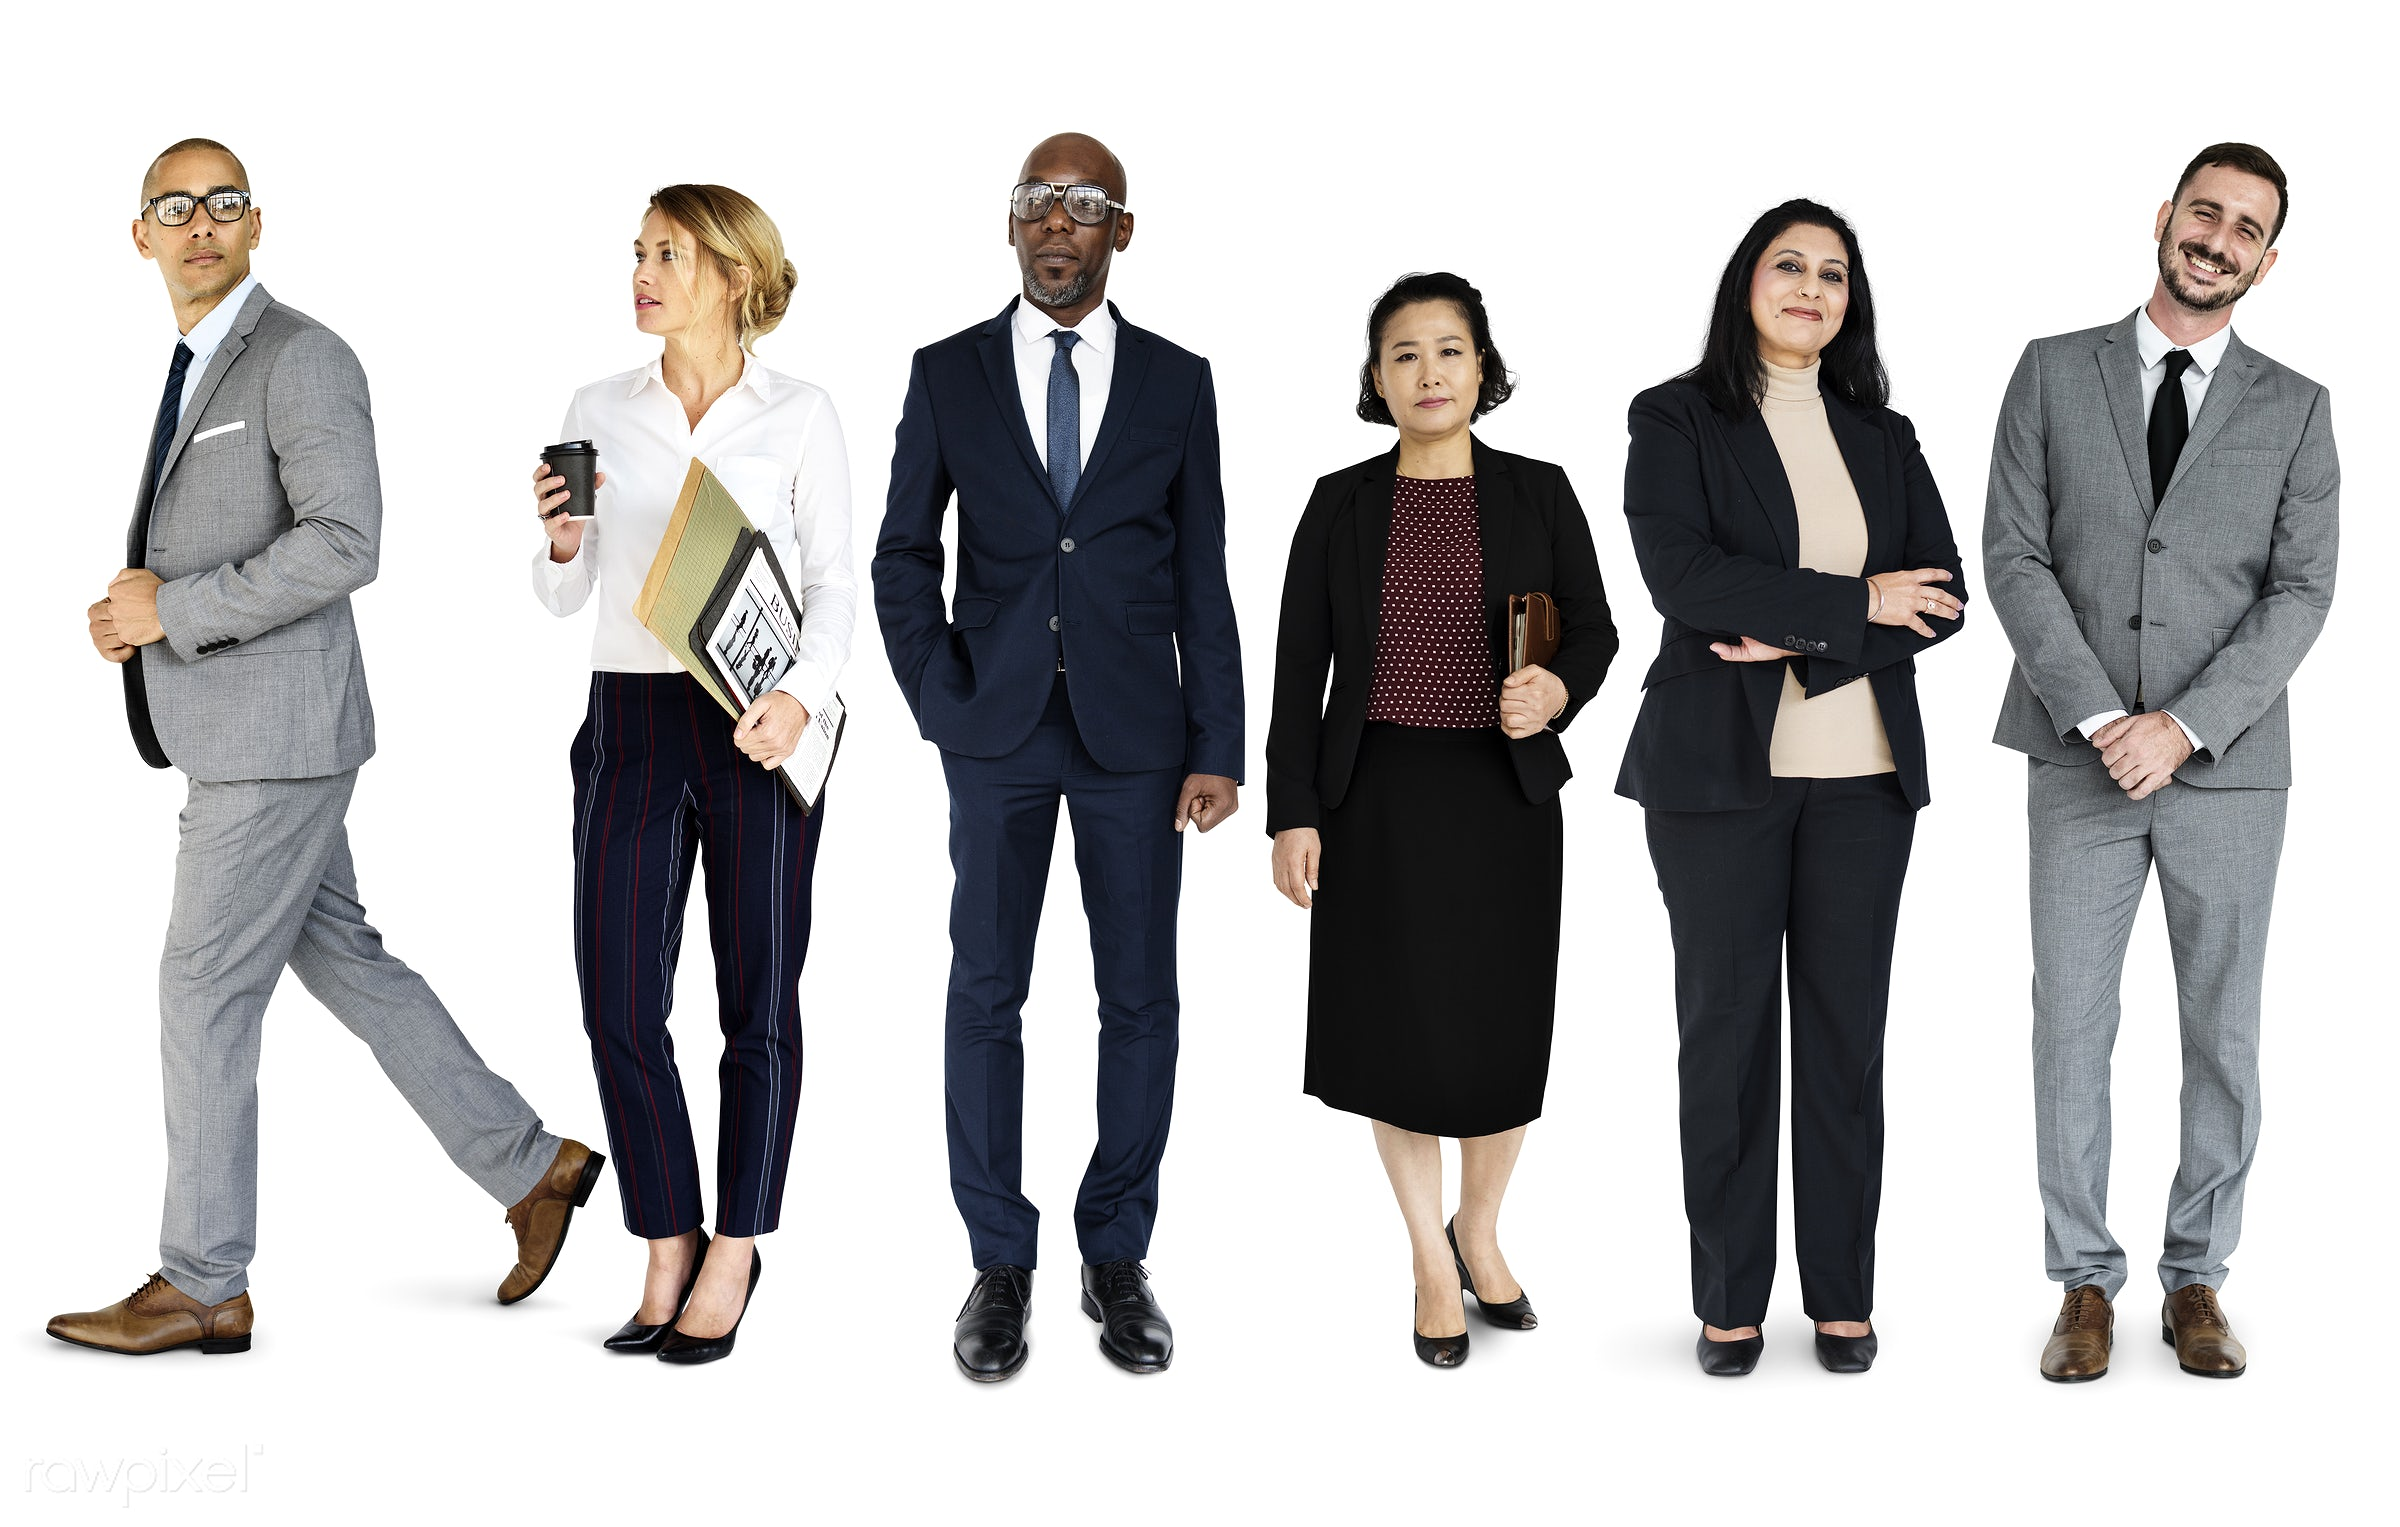 adult, business, businessman, businessmen, businesswoman, businesswomen, career, cheerful, collection, diverse, diversity,...